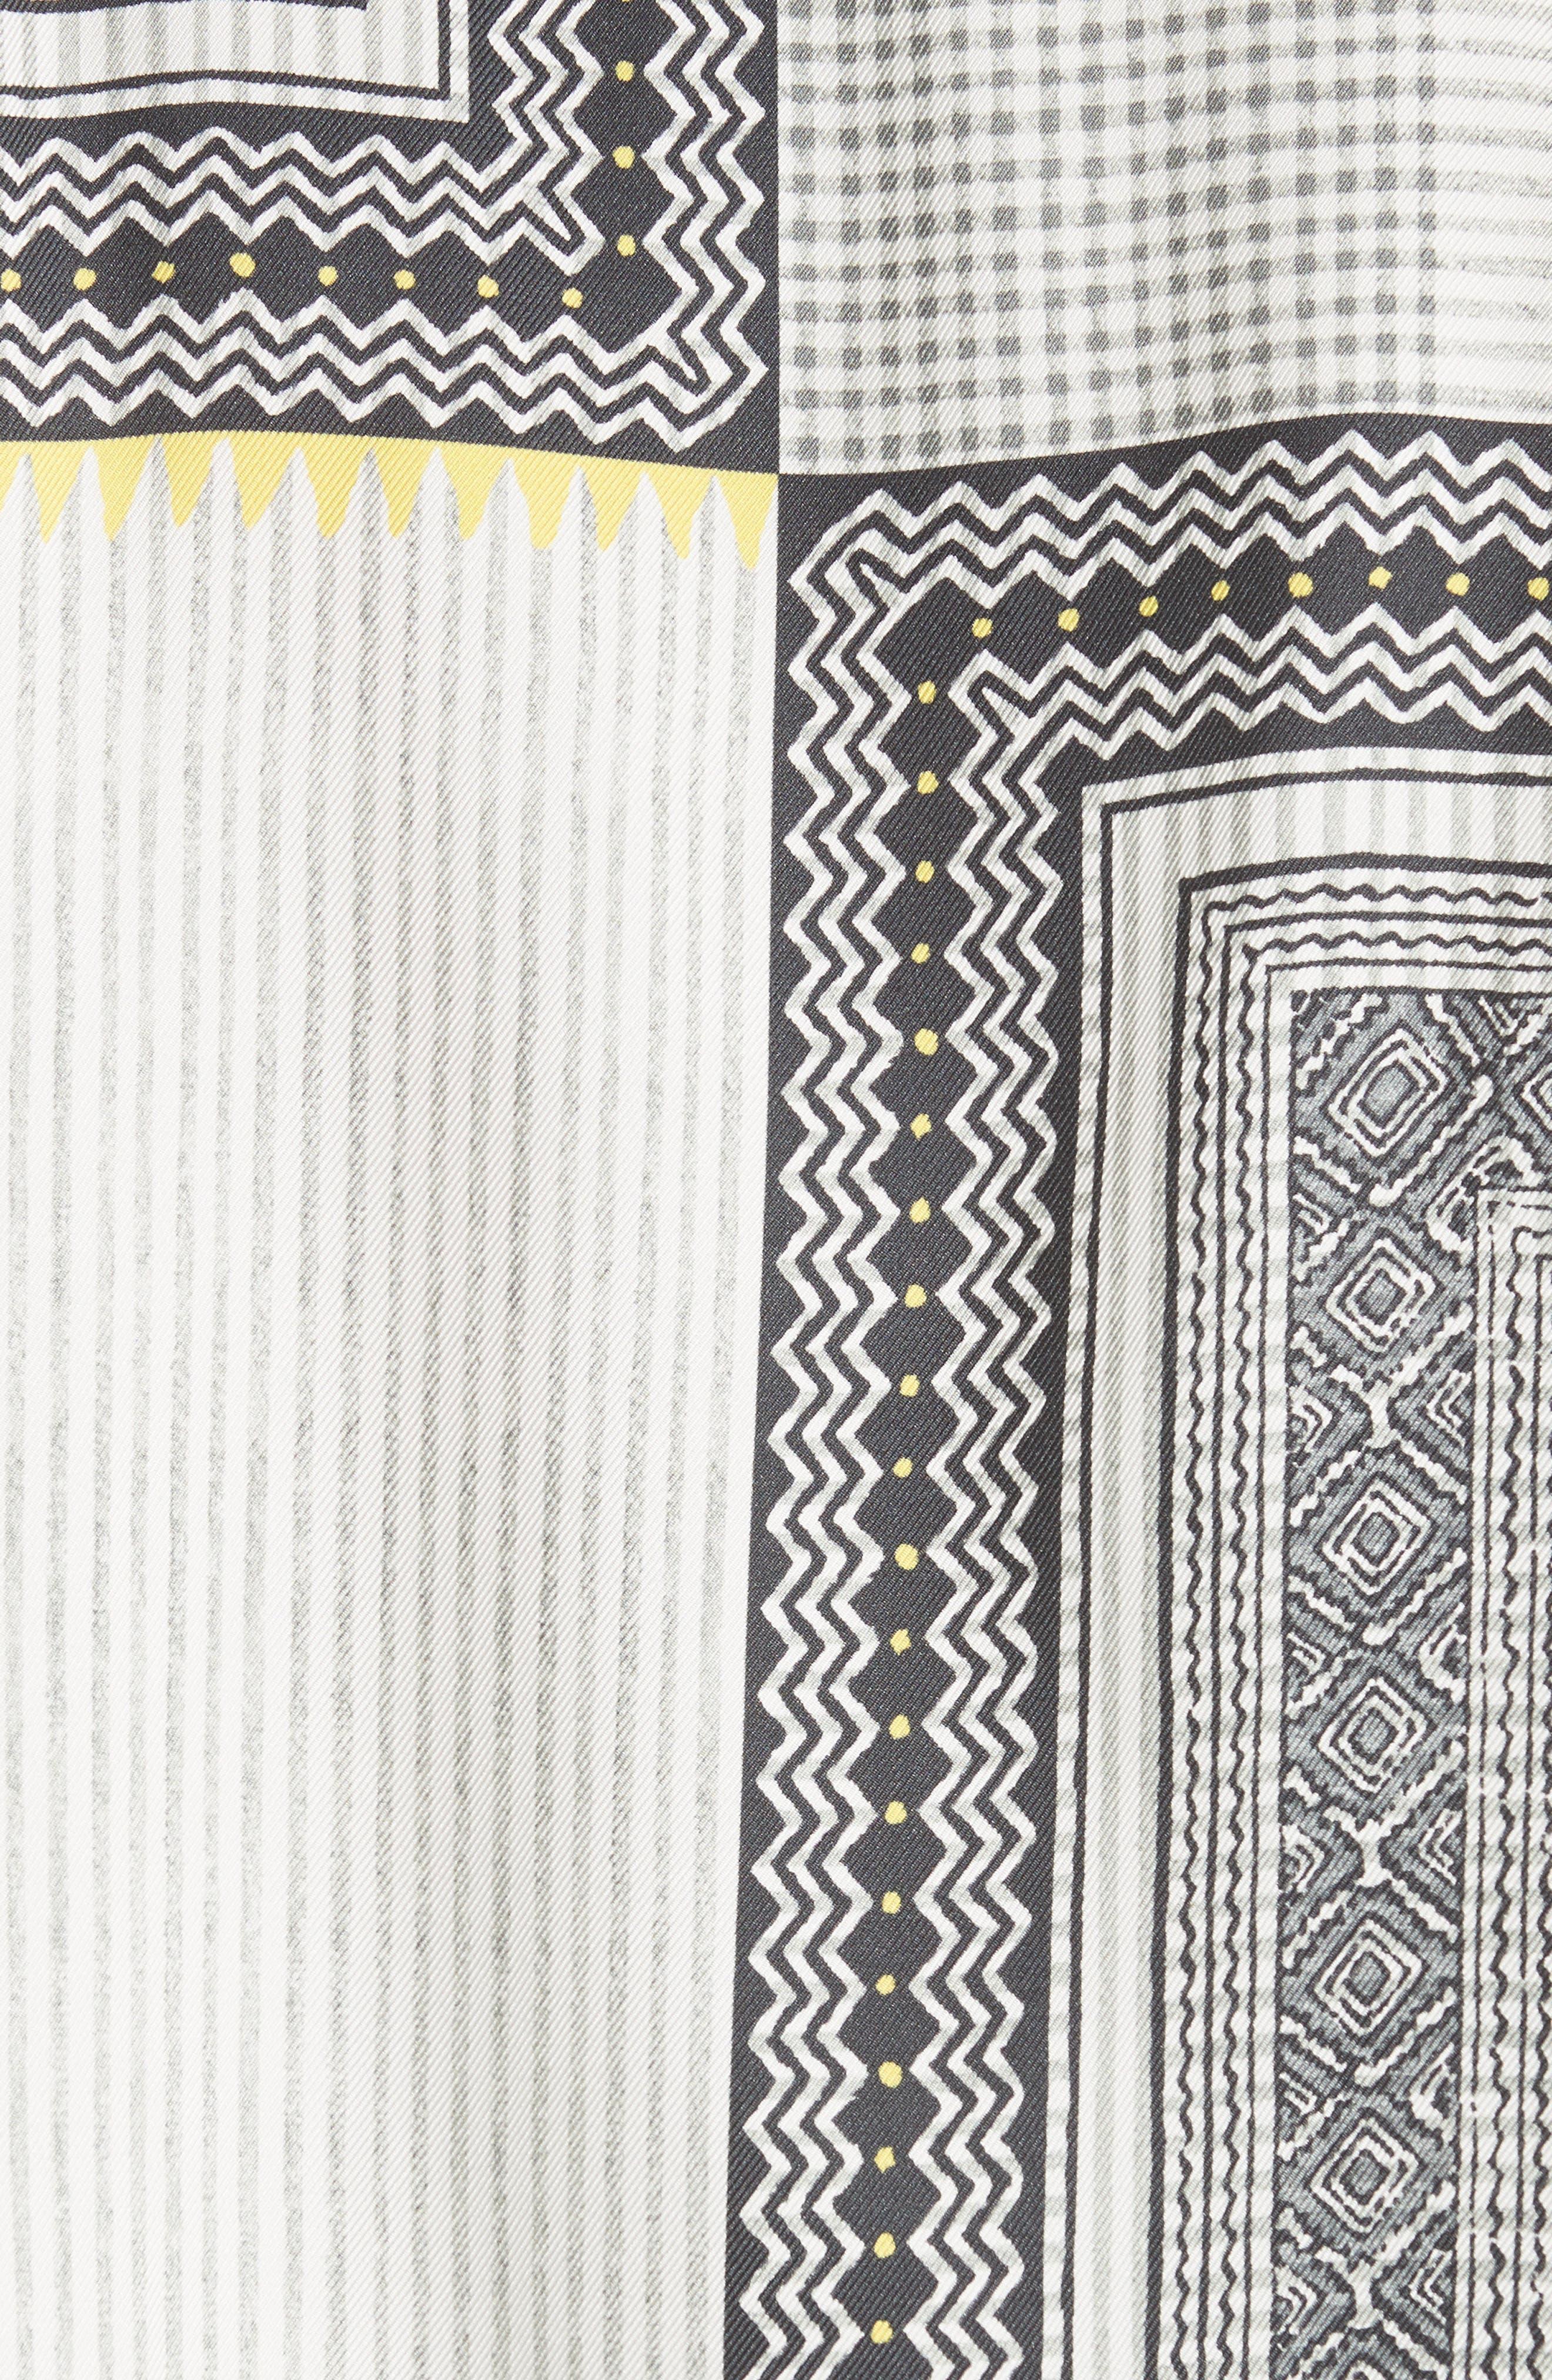 Pearl Button Silk Top,                             Alternate thumbnail 6, color,                             White